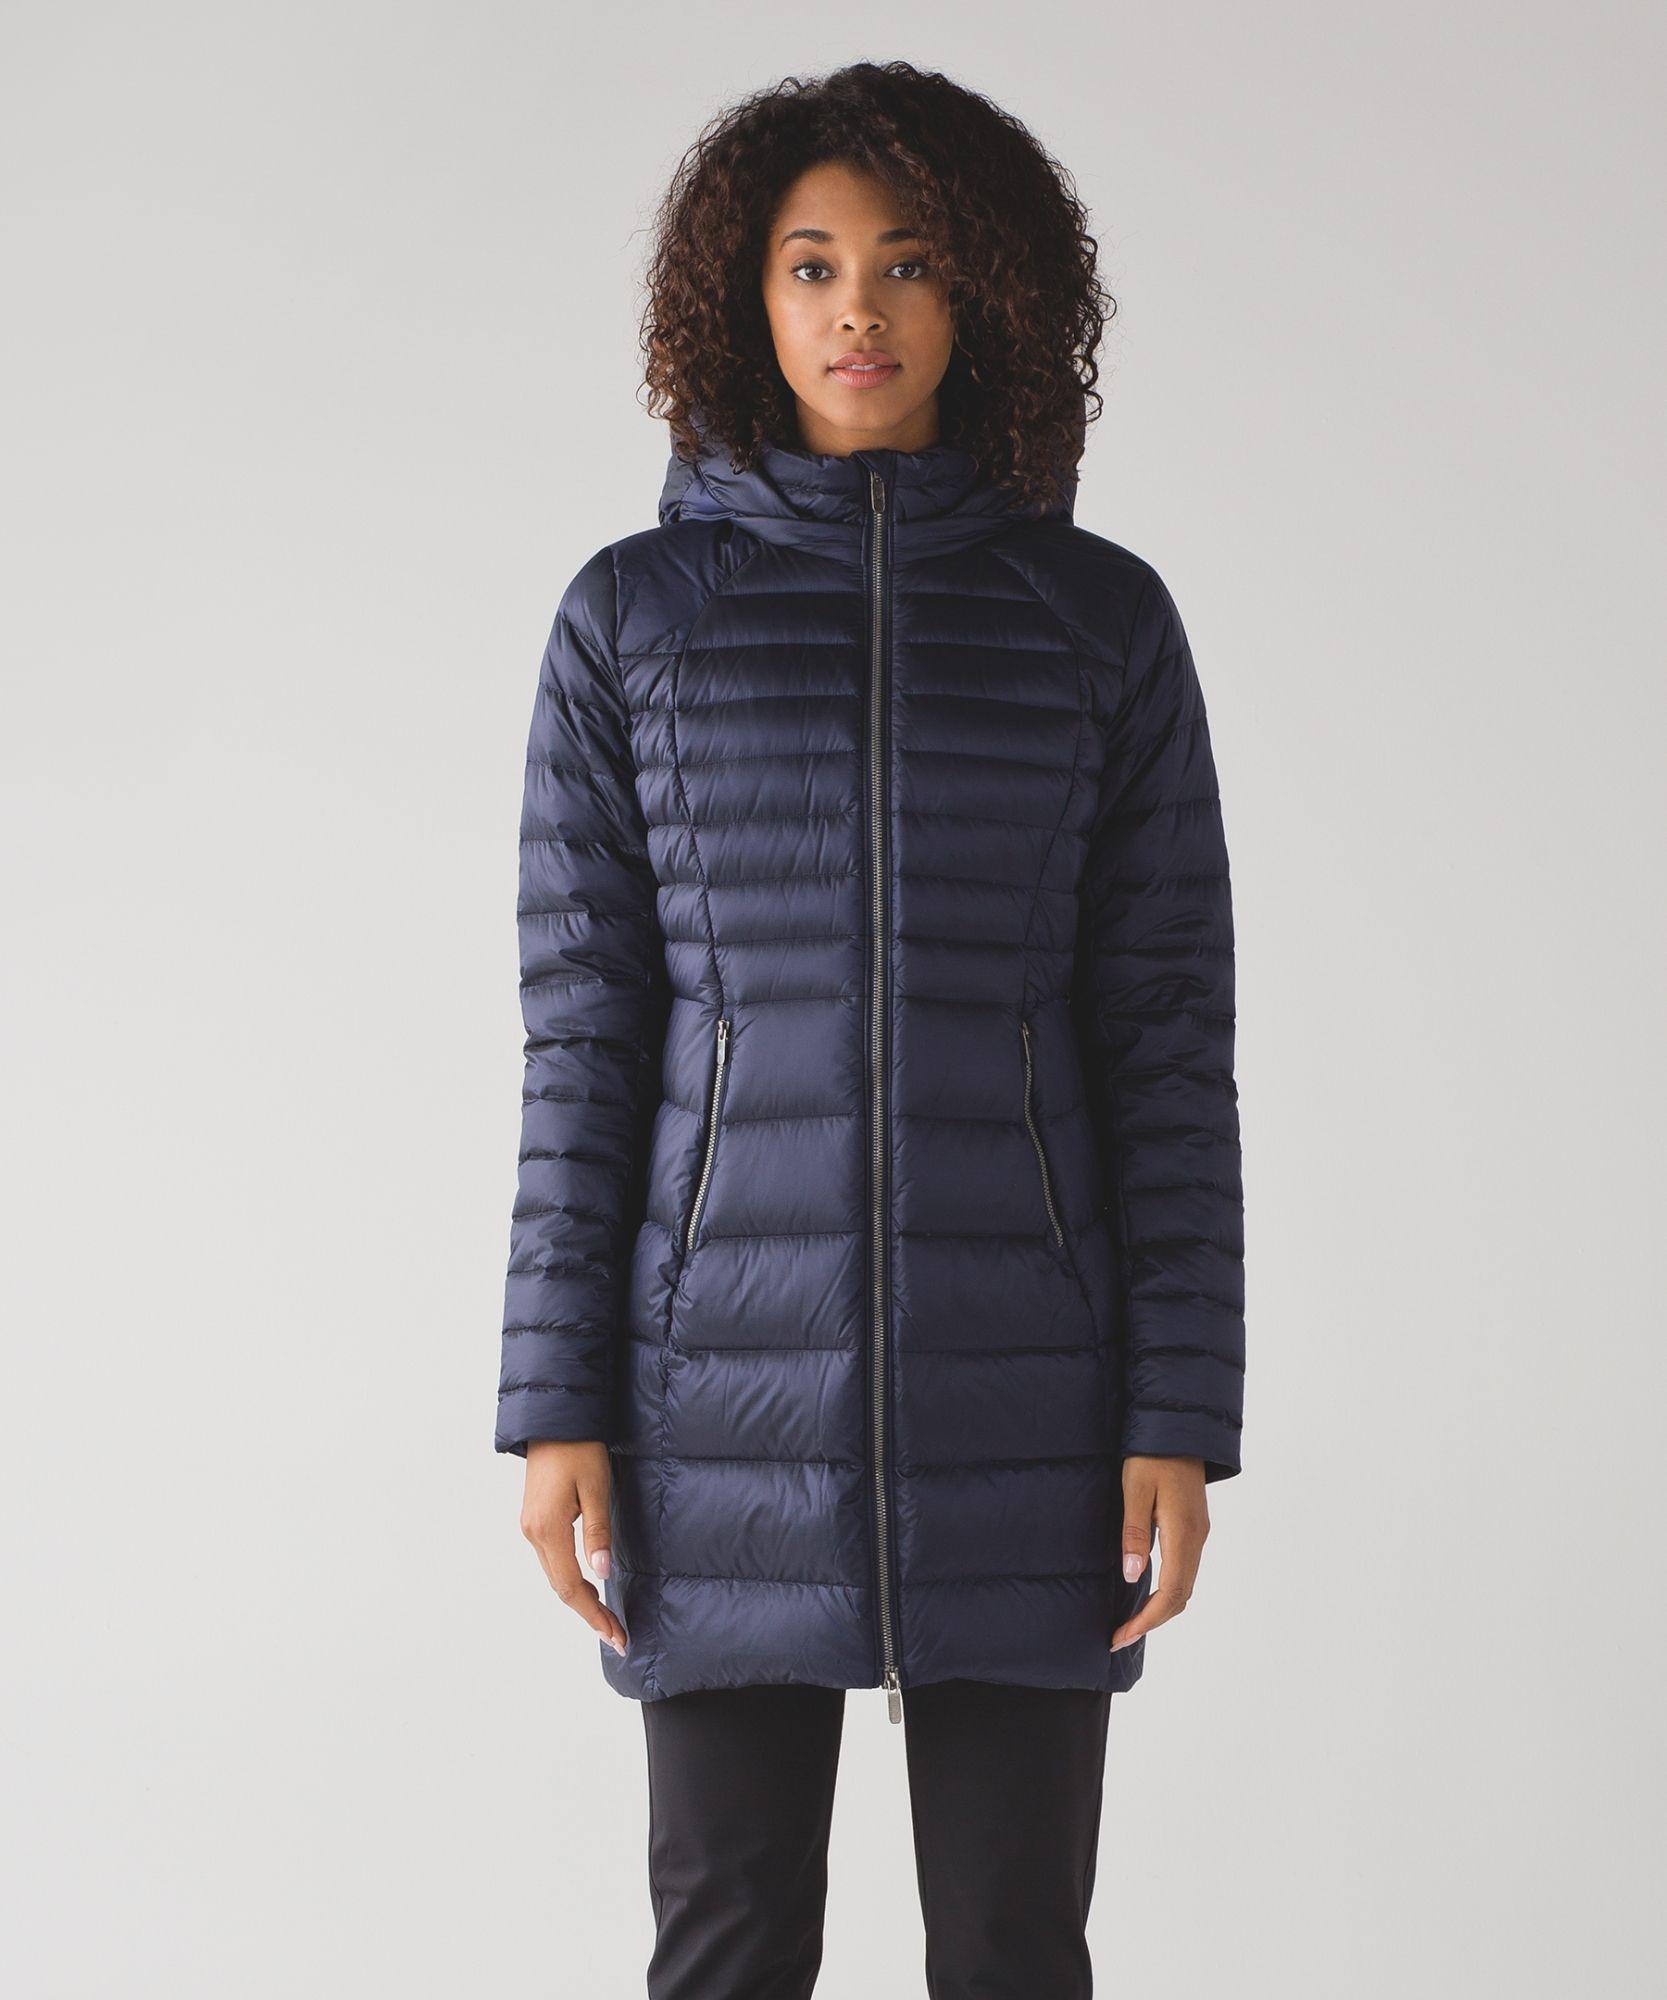 Pin By Andrea Krempl On Christmas 2016 Cold Jacket Lululemon Outerwear Women [ 2000 x 1667 Pixel ]